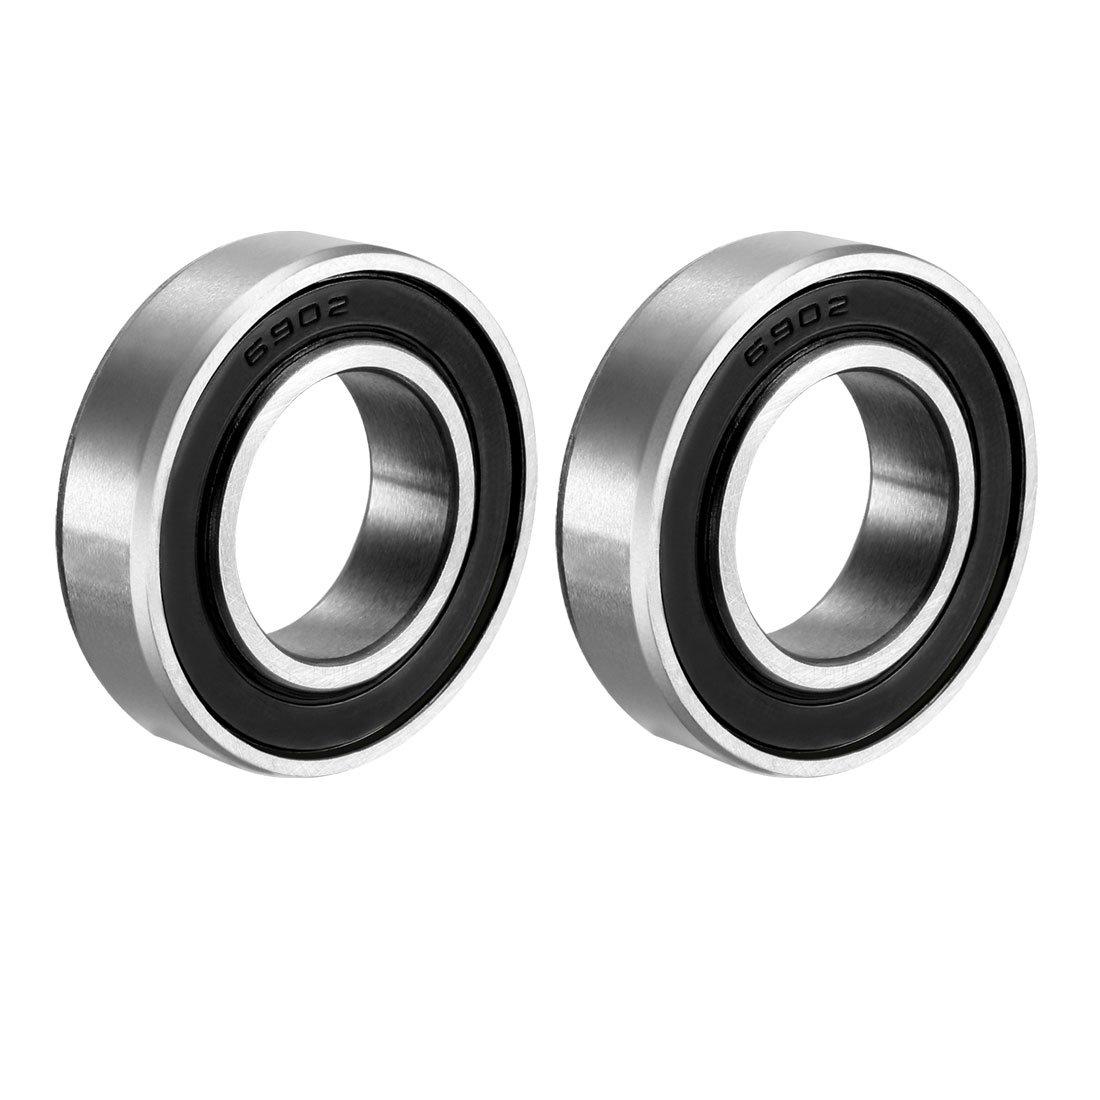 Rodamiento rígido uxcell 6902-2RS 15mm x 28mm x 7mm (2un)